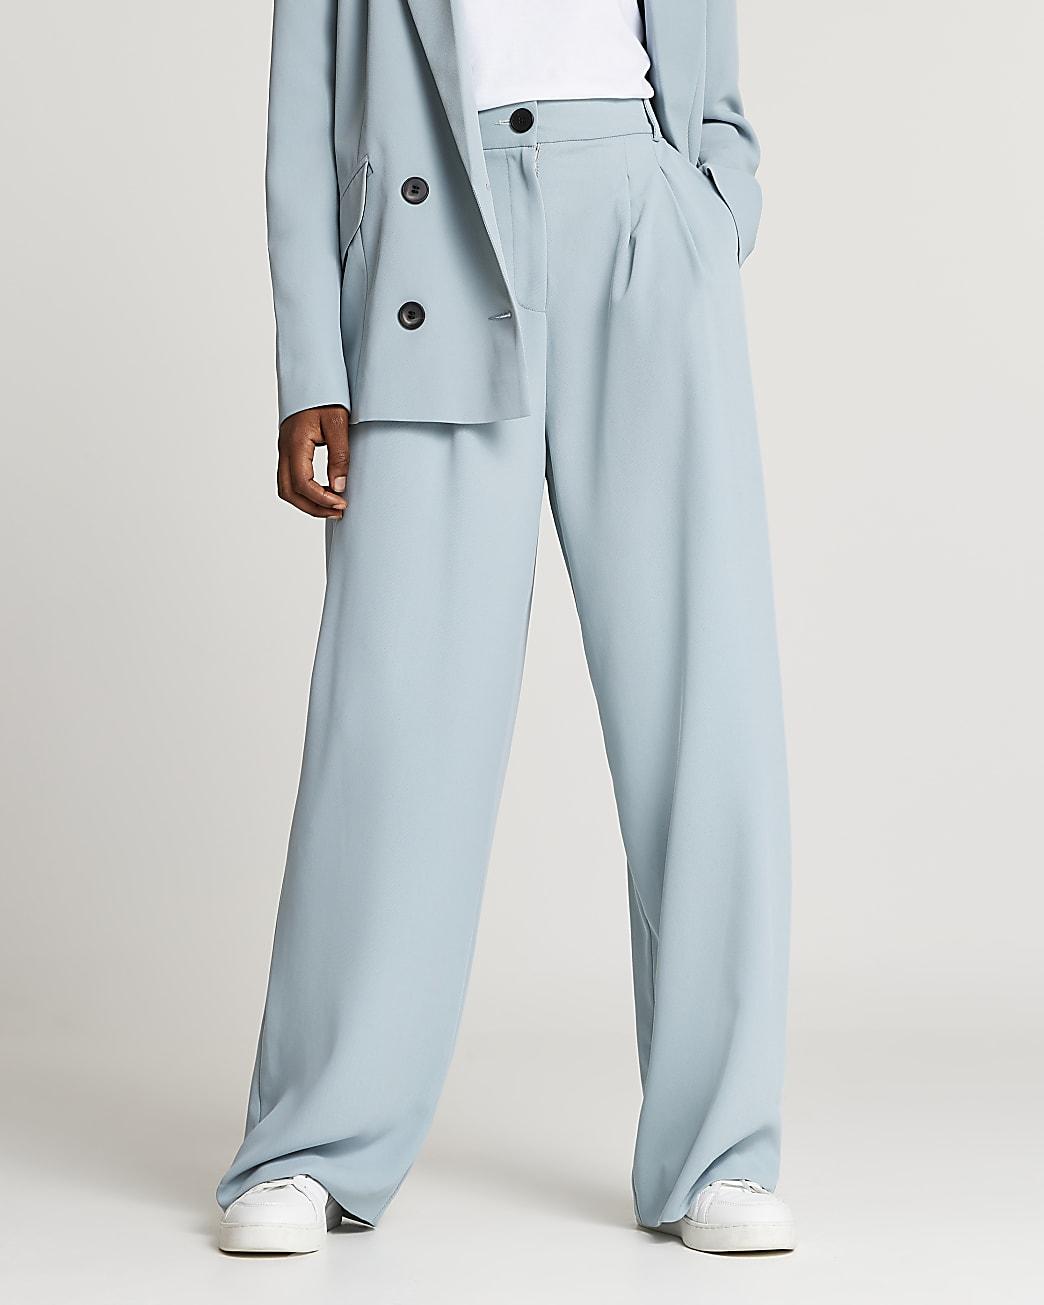 Blue wide leg pleated trousers